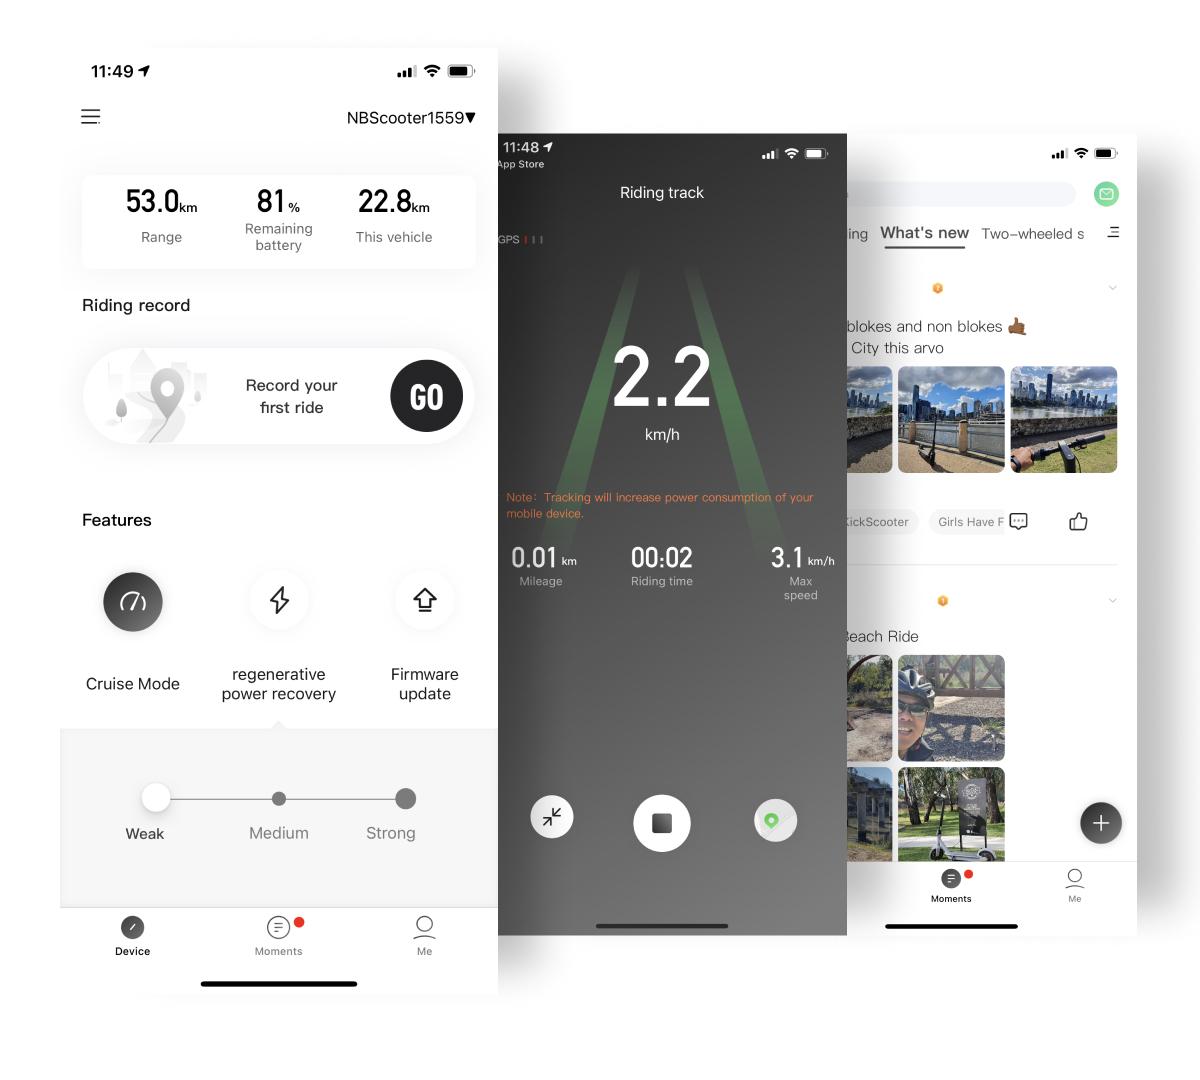 Ninebot Gokart Pro (e-GoKart) (รุ่นใหม่ล่าสุด 2022 Version New แรงกว่าเดิม)